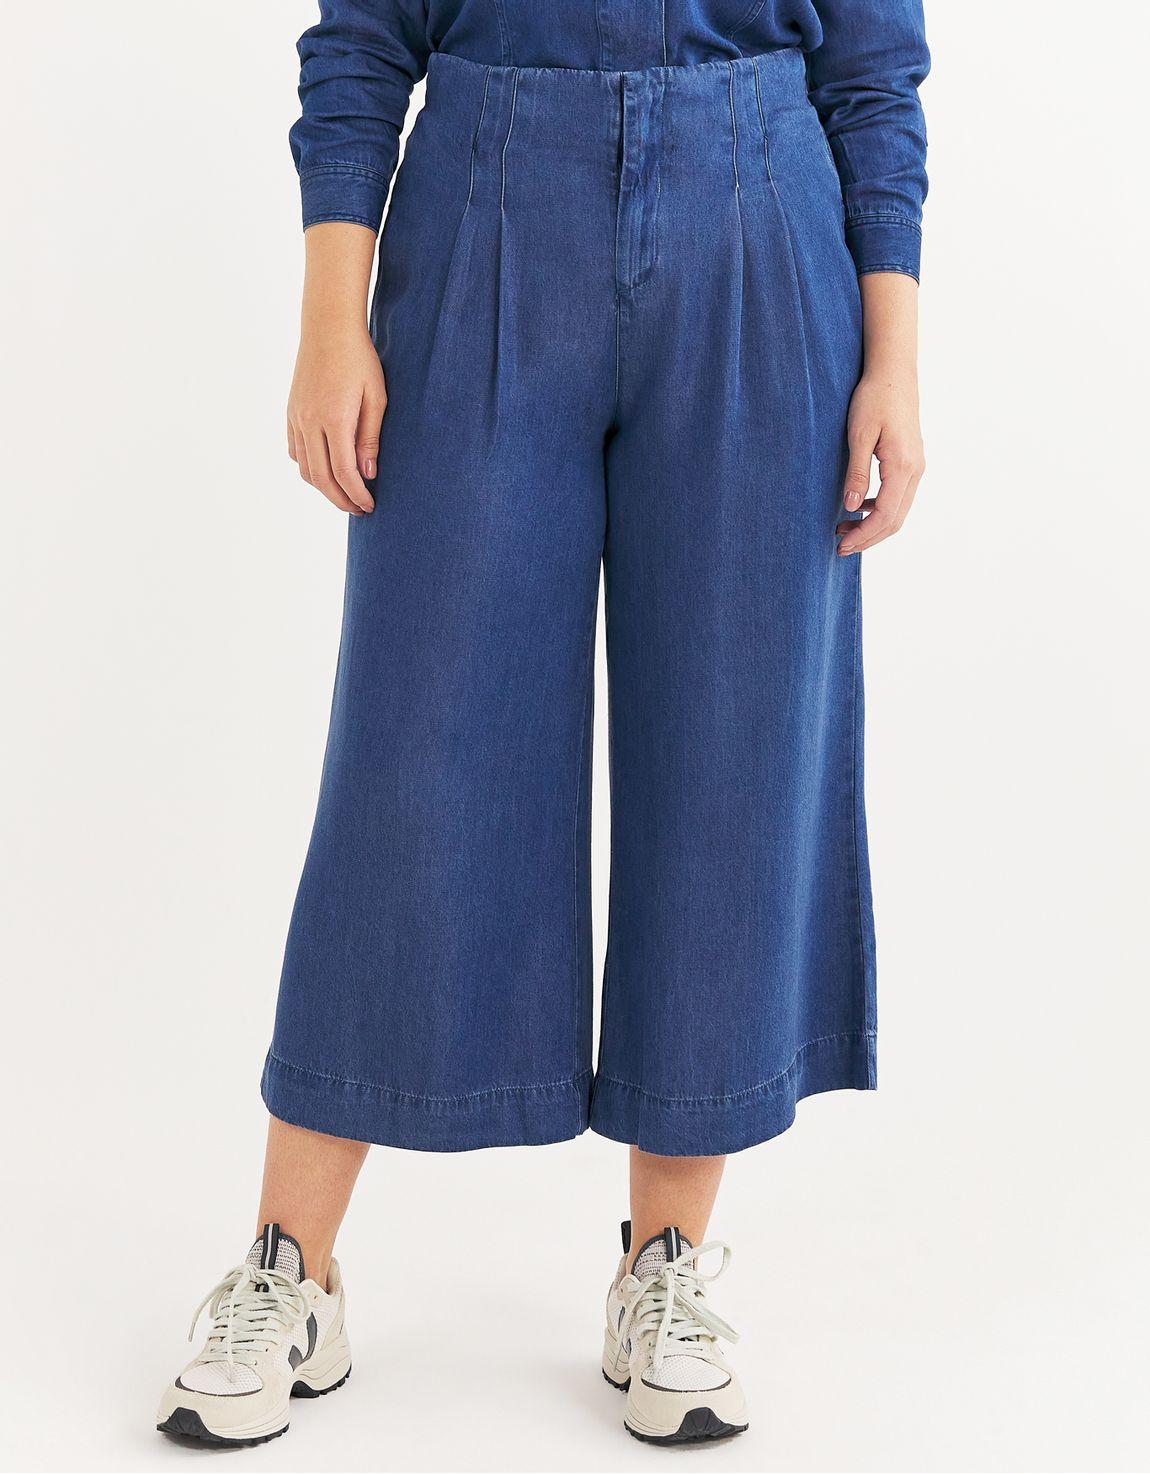 Calça pantacourt liocel jeans